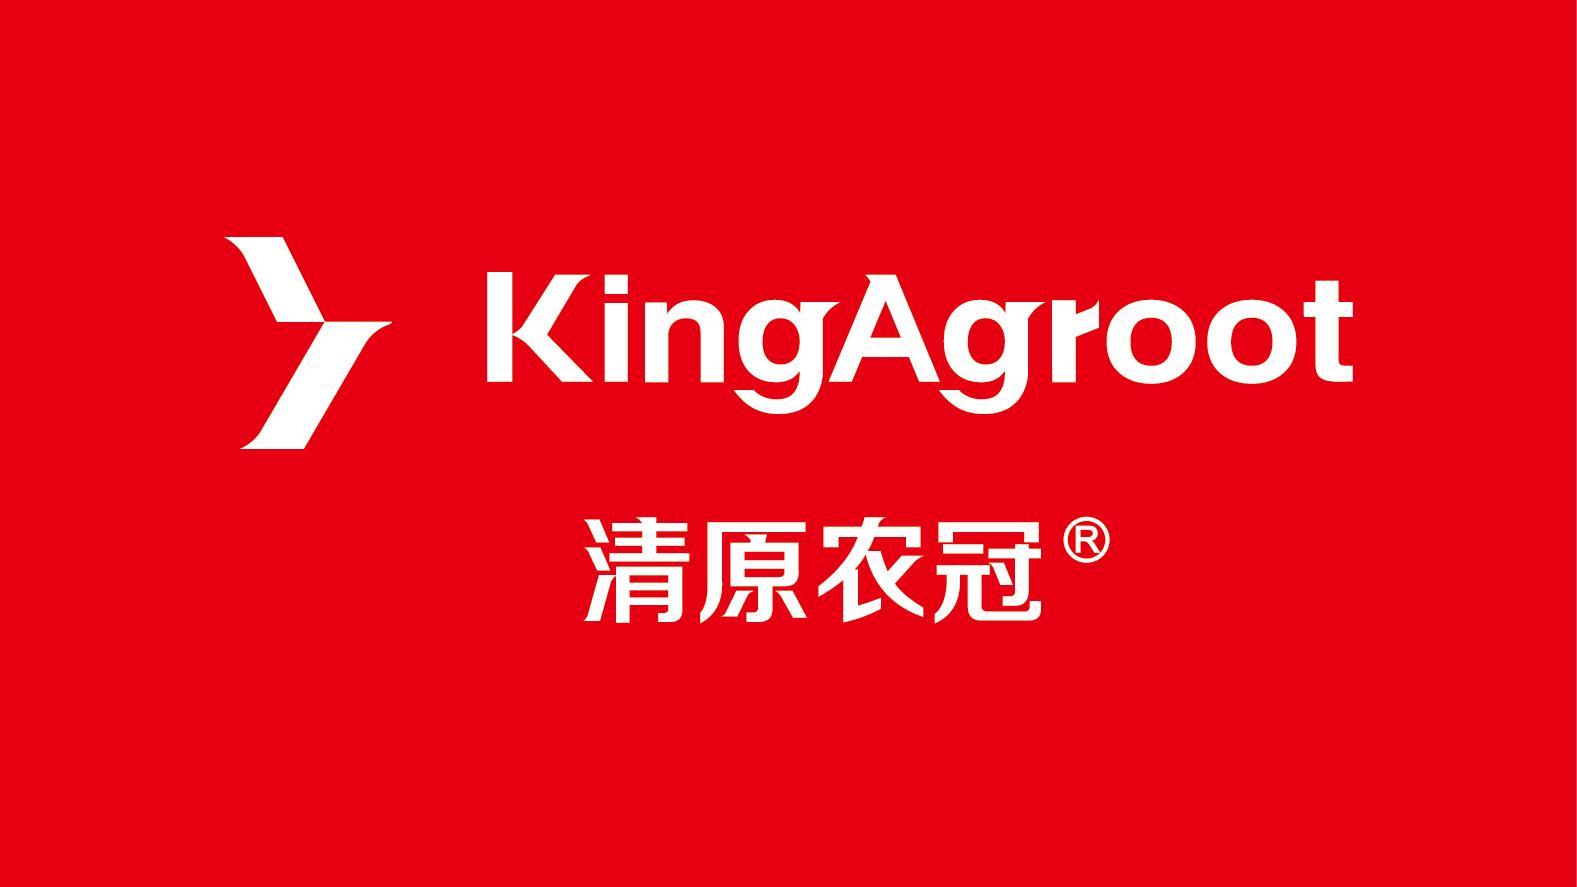 Qingdao KingAgroot Resistant Weed Management Co., Ltd.);